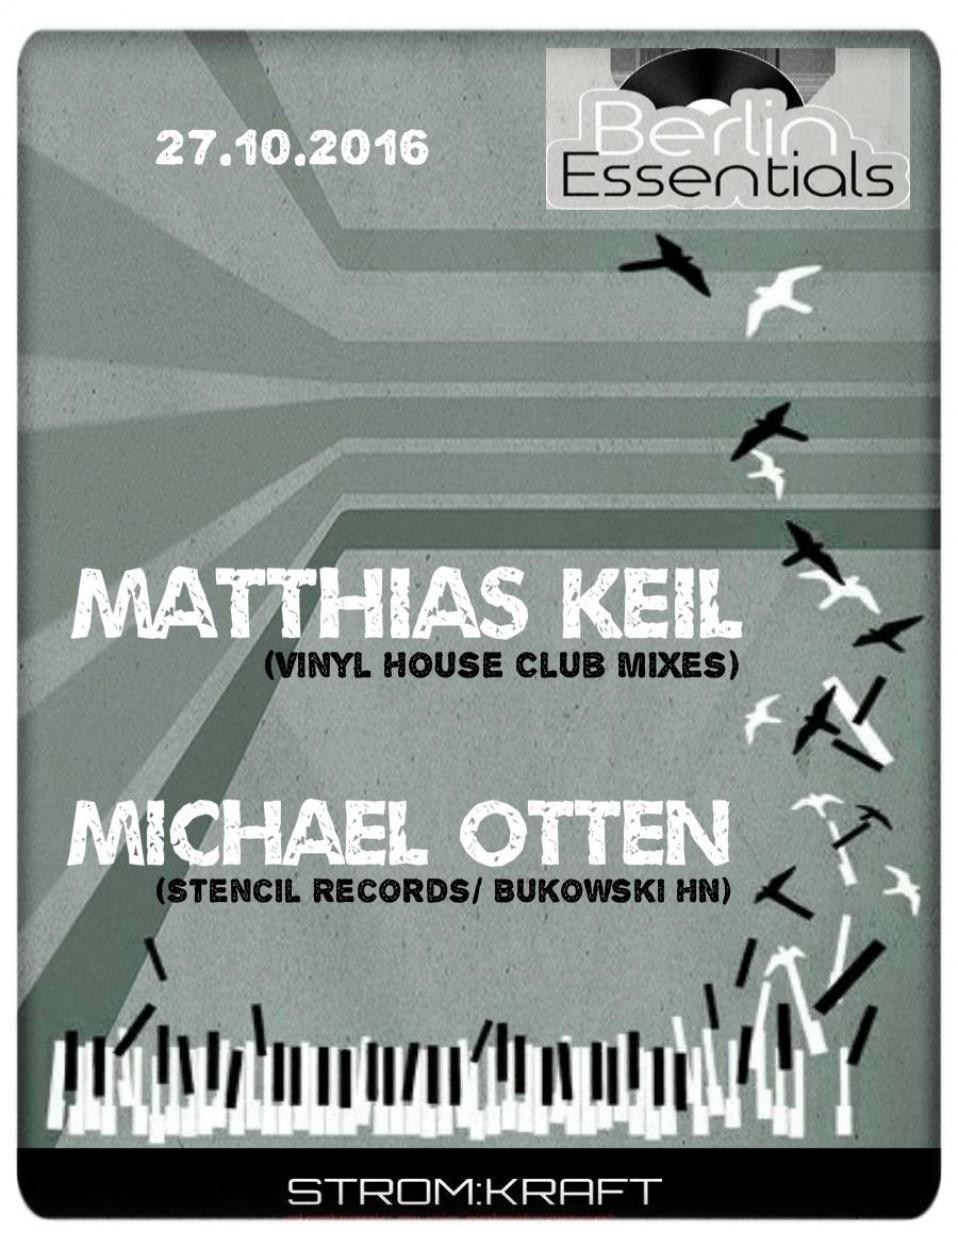 Thursday October 27th 08.00pm CET- Berlin Essentials Radio by Michael Otten ( Stencil Rec.)